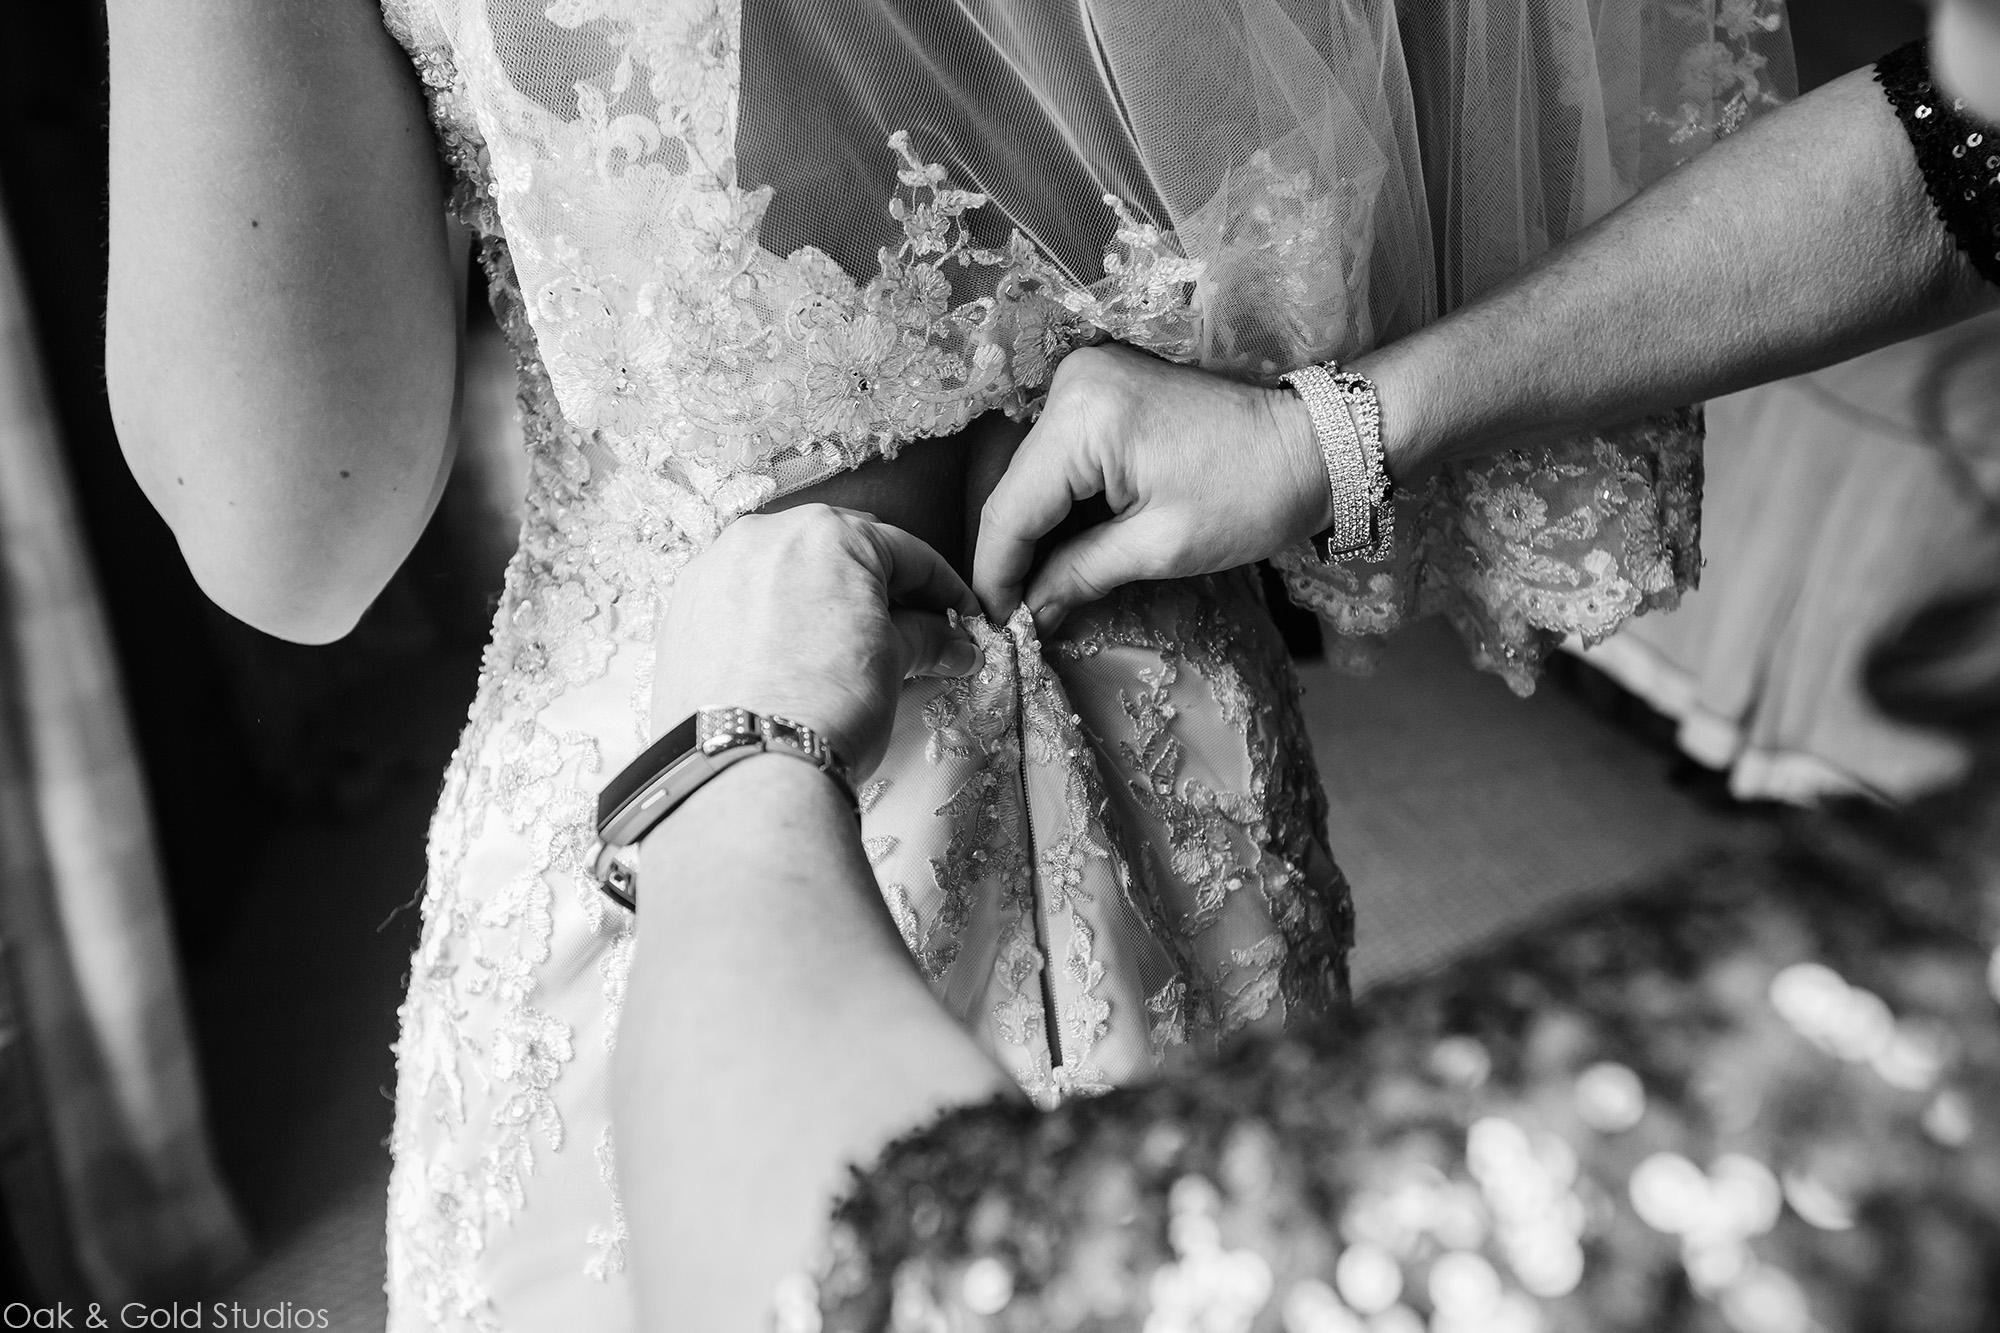 vinewood bride dress.jpg